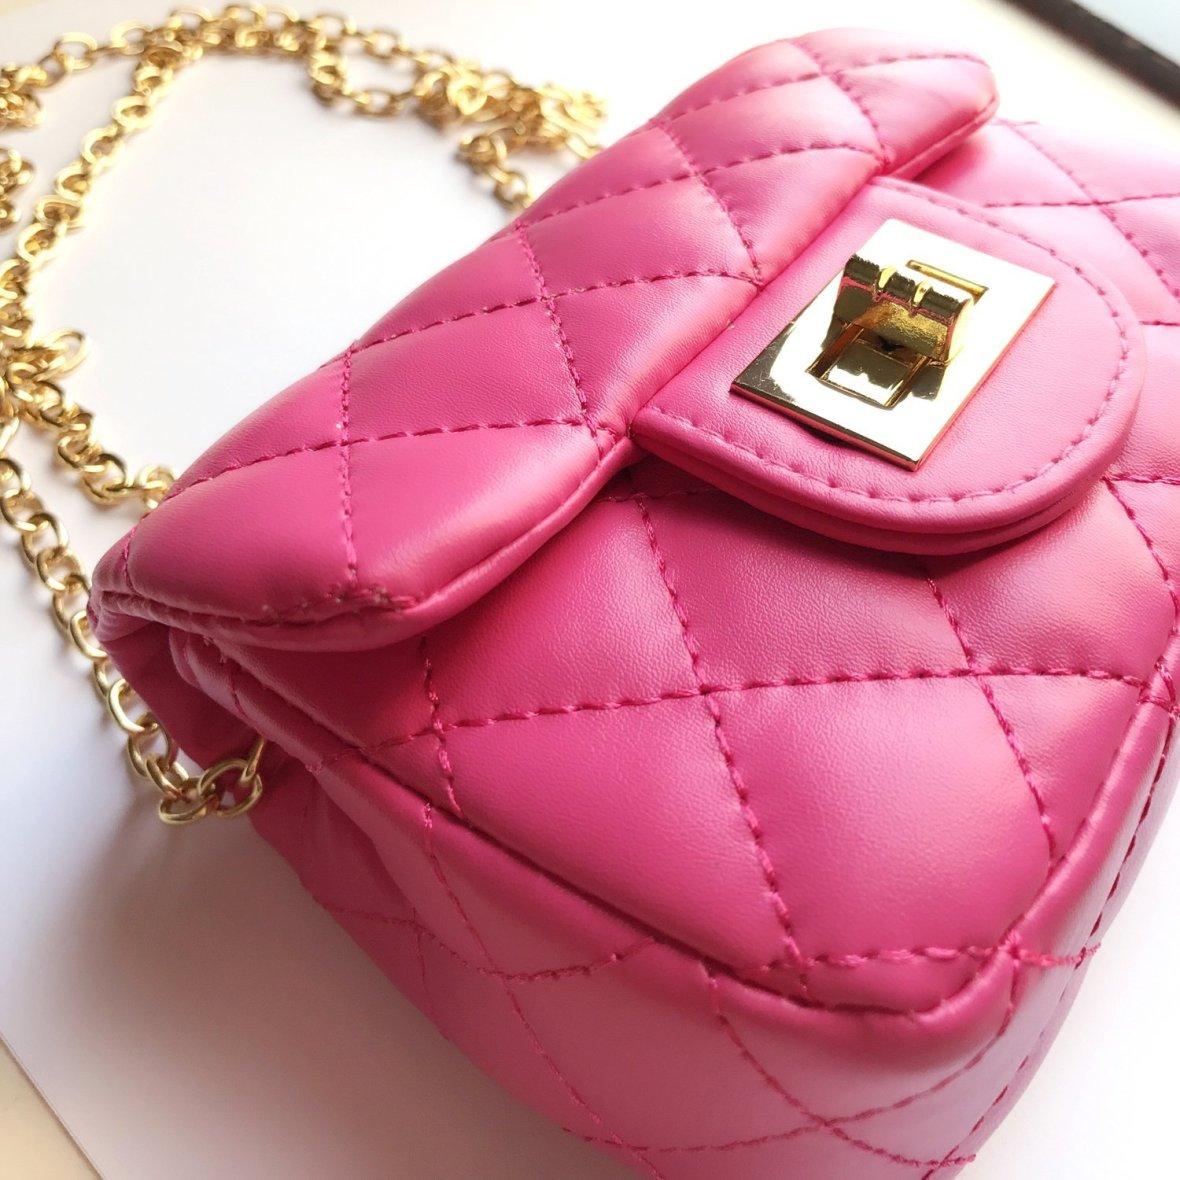 halloween 2017_itw - pink crossbody bag